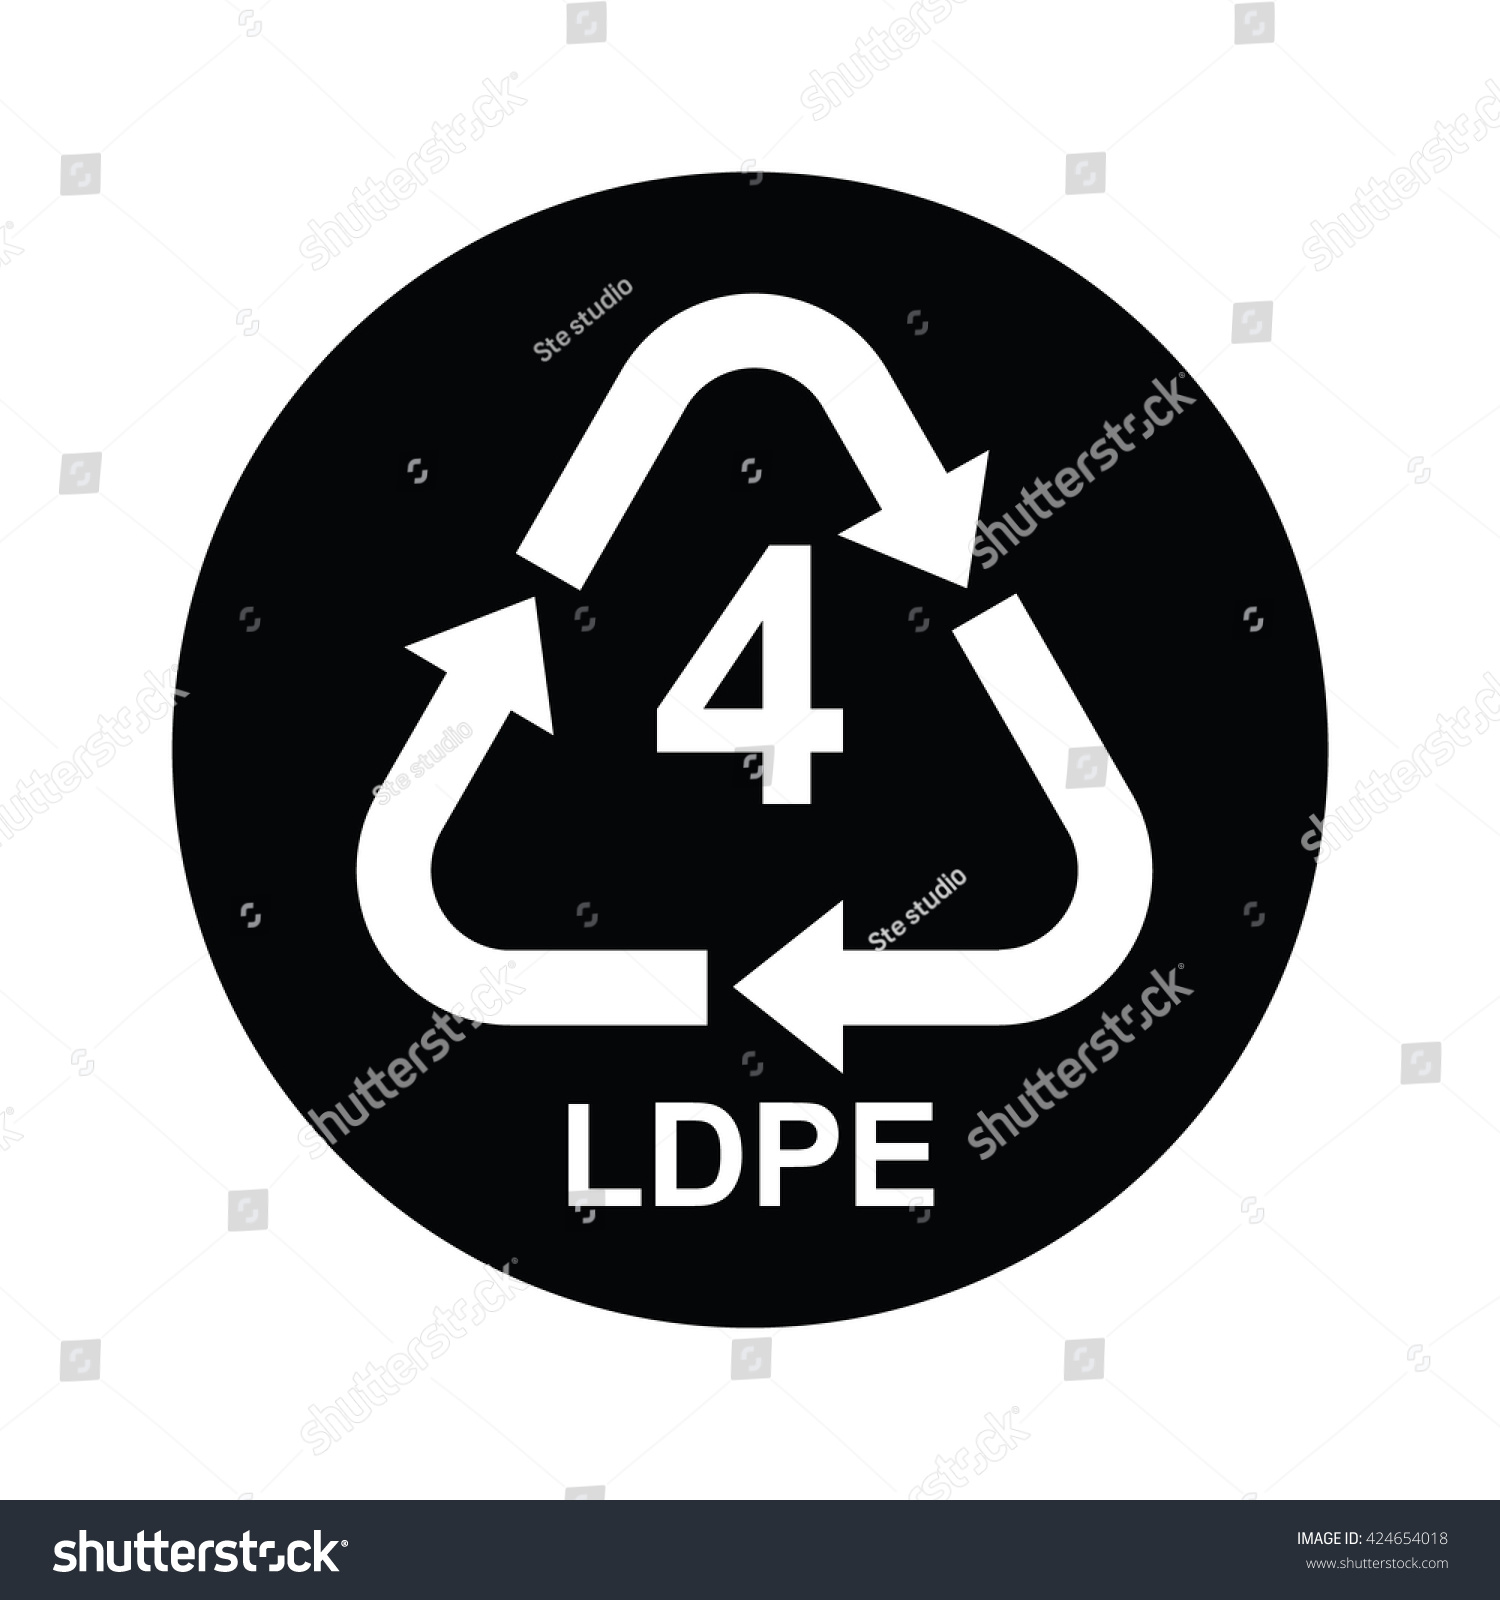 Plastic recycling symbol ldpe 4 black stock vector 424654018 plastic recycling symbol ldpe 4 in black circle vector illustration biocorpaavc Choice Image